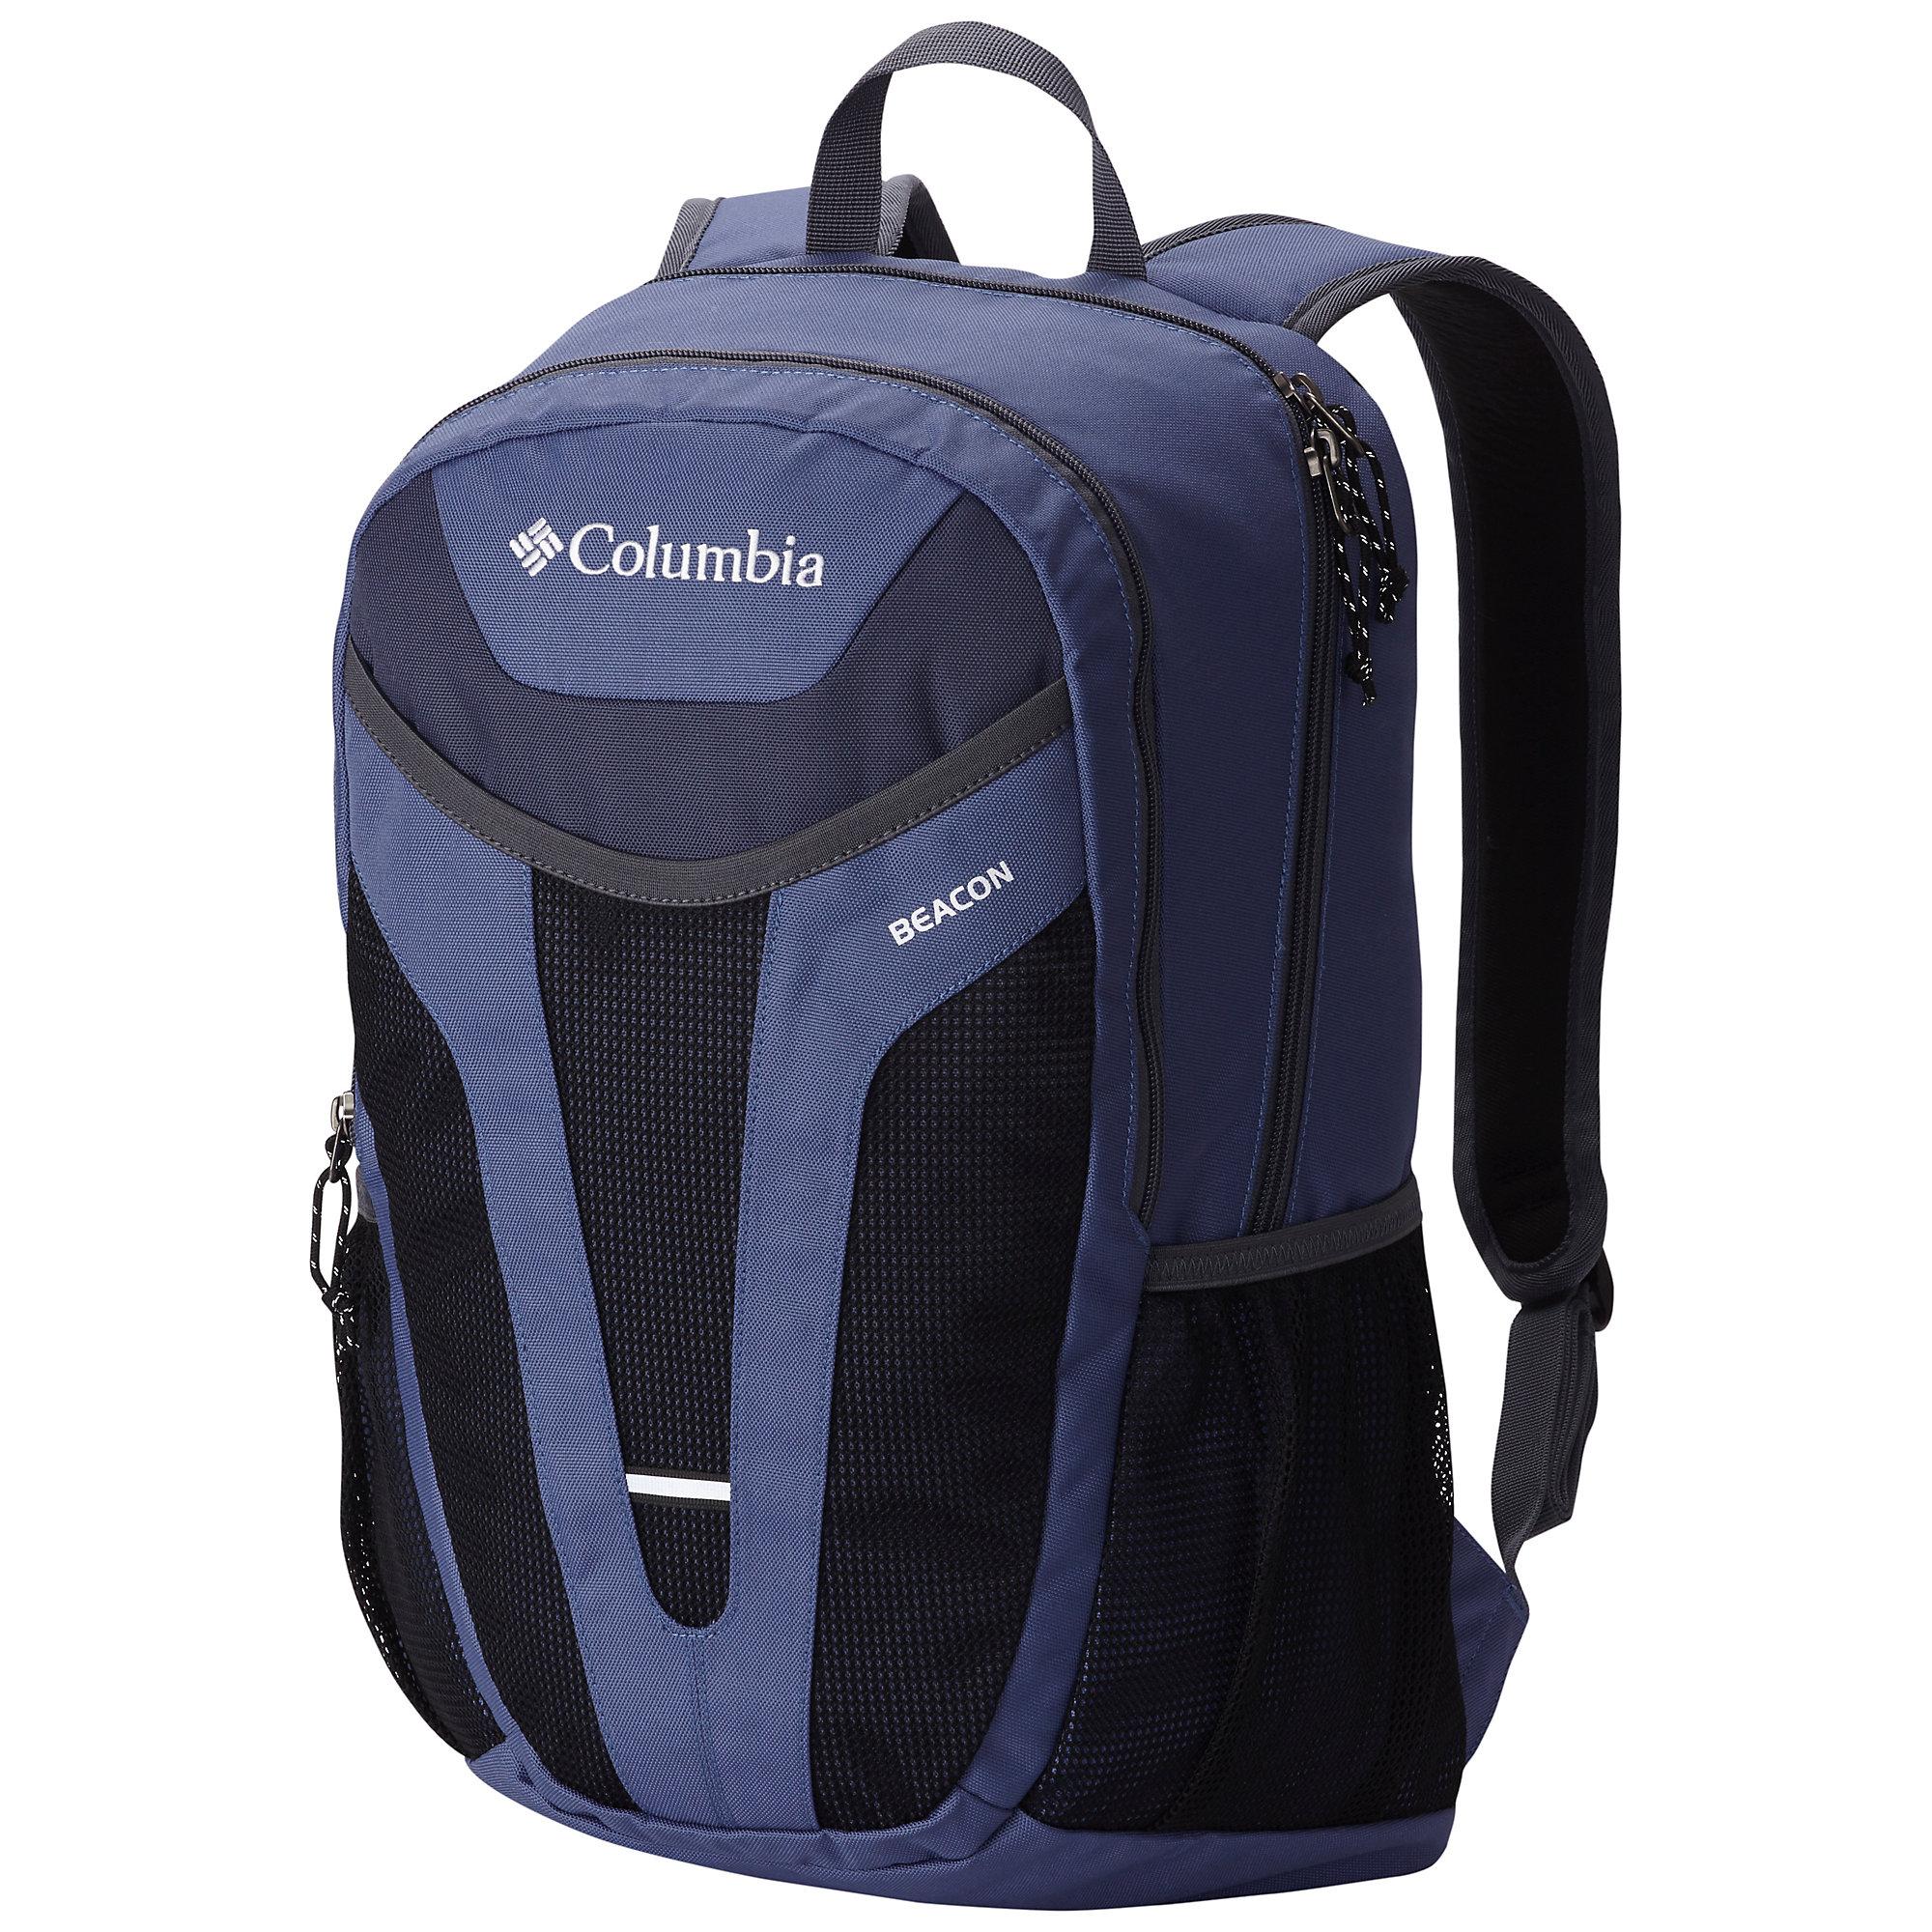 Columbia Beacon Daypack